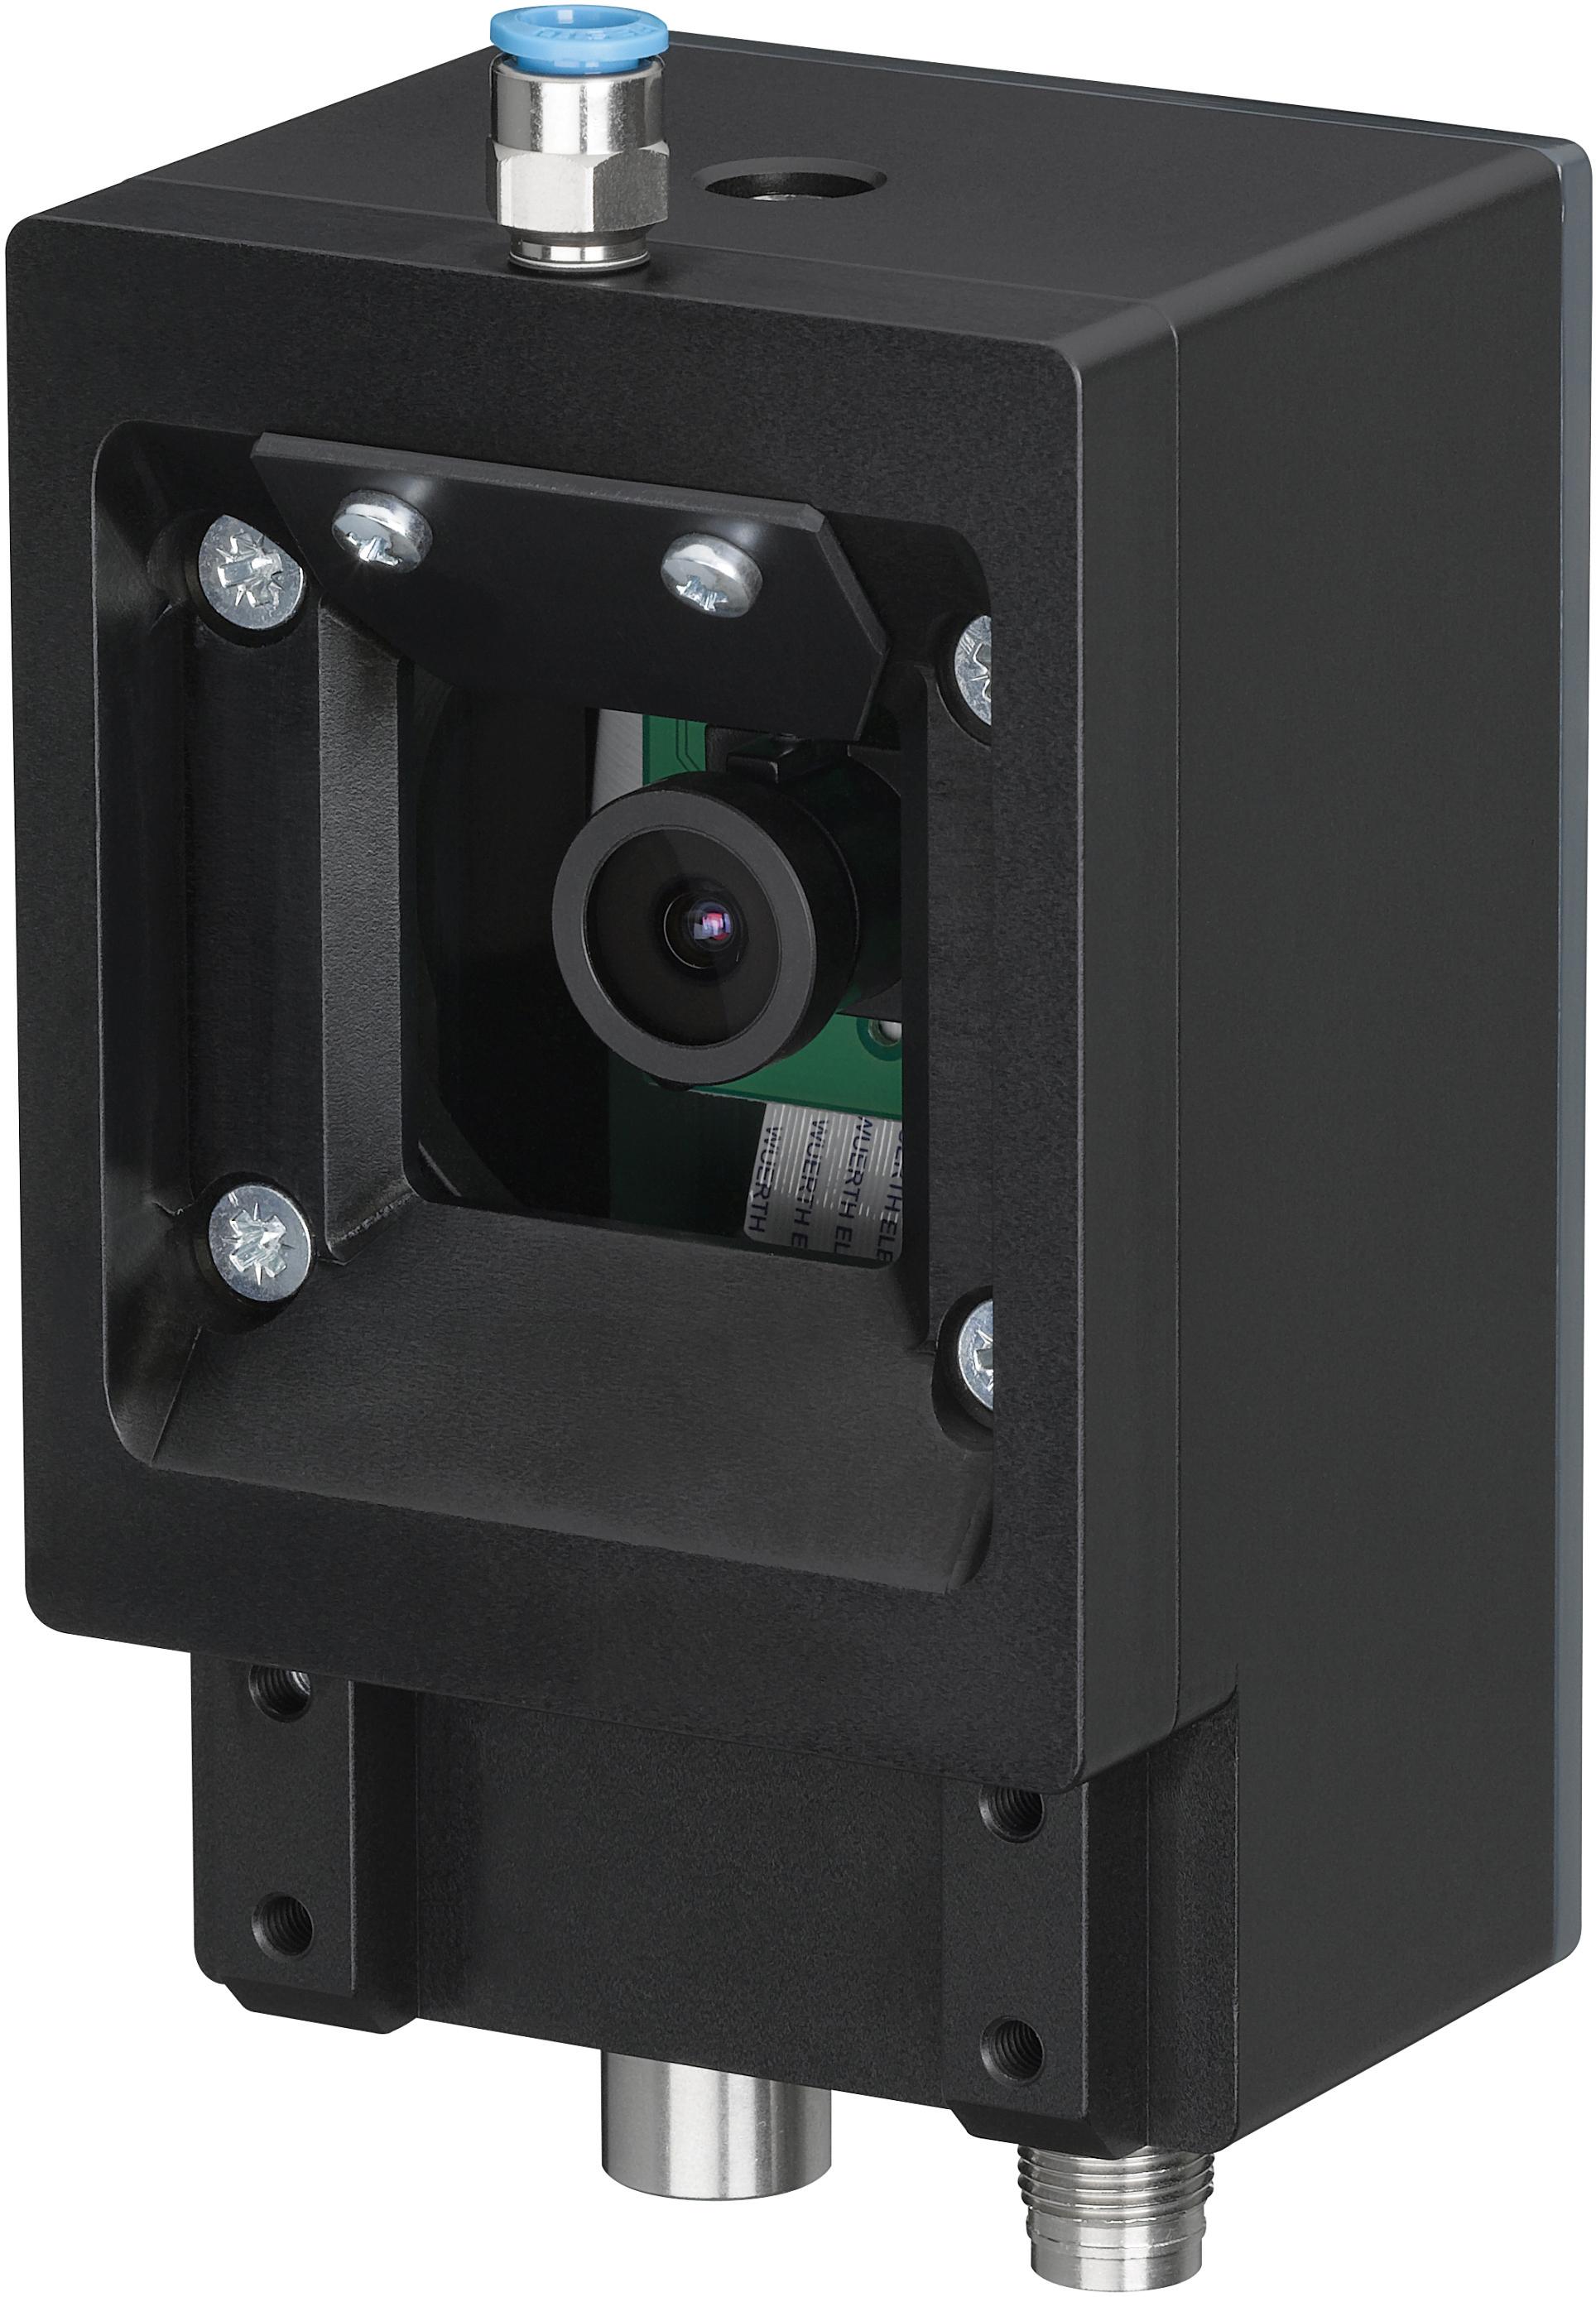 Leuze propose une caméra intelligente